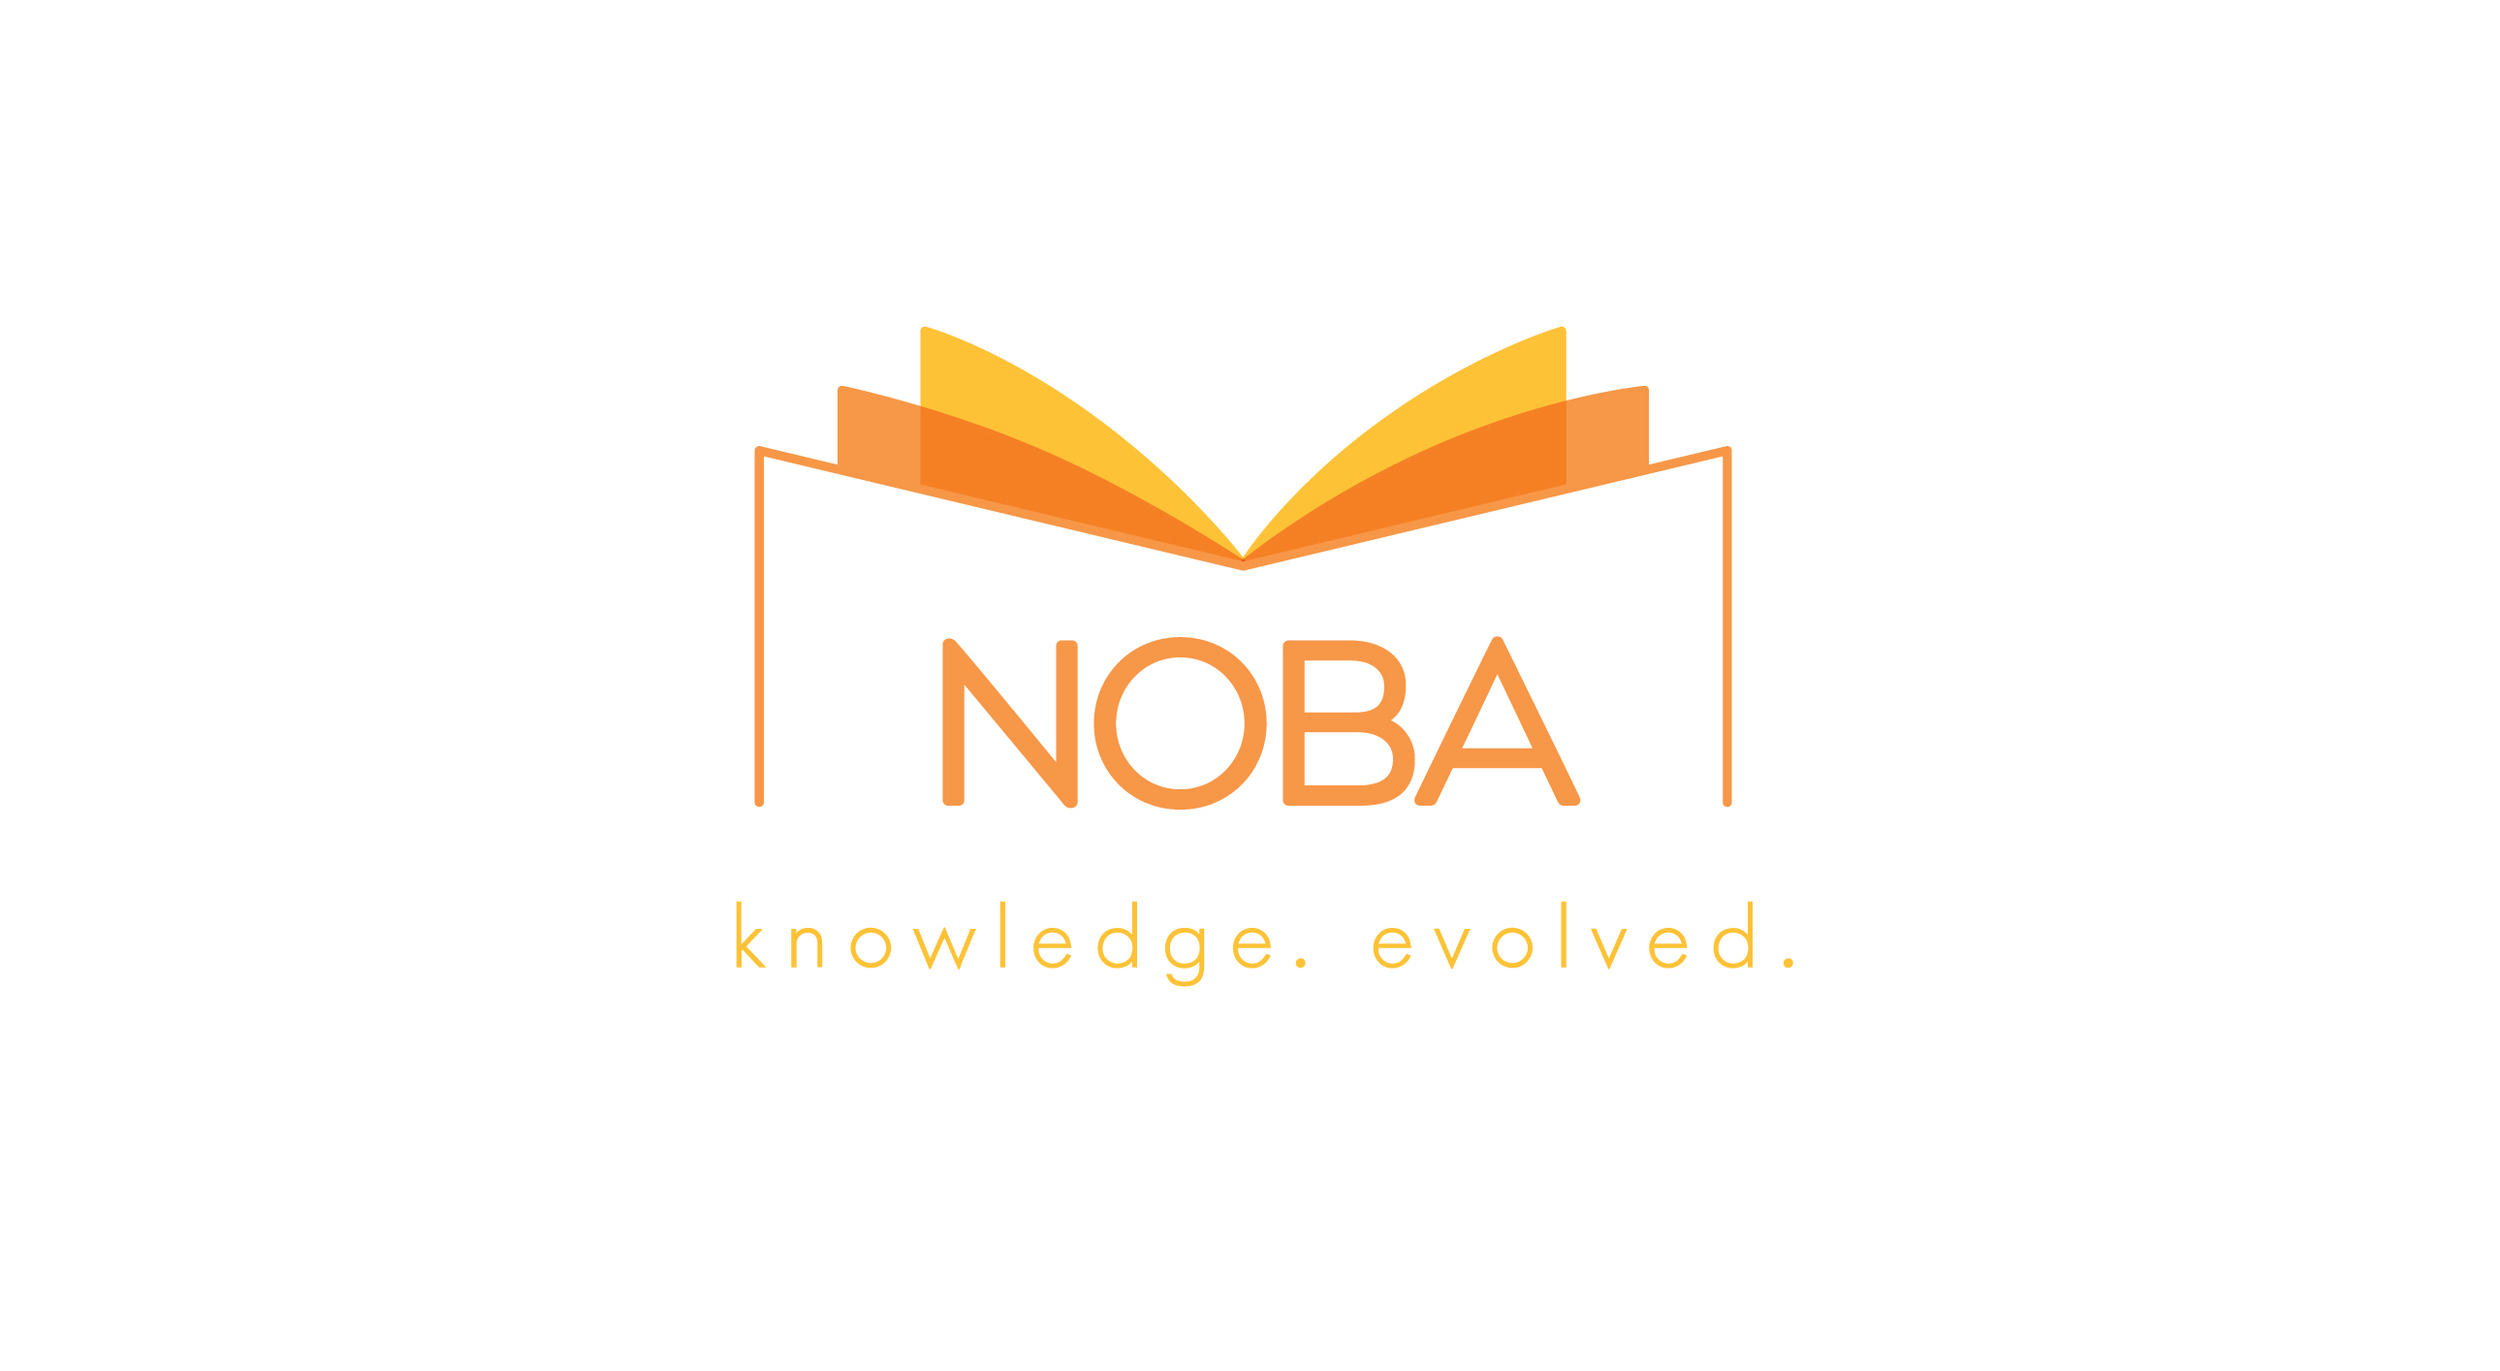 Noba-rejects-04.jpg